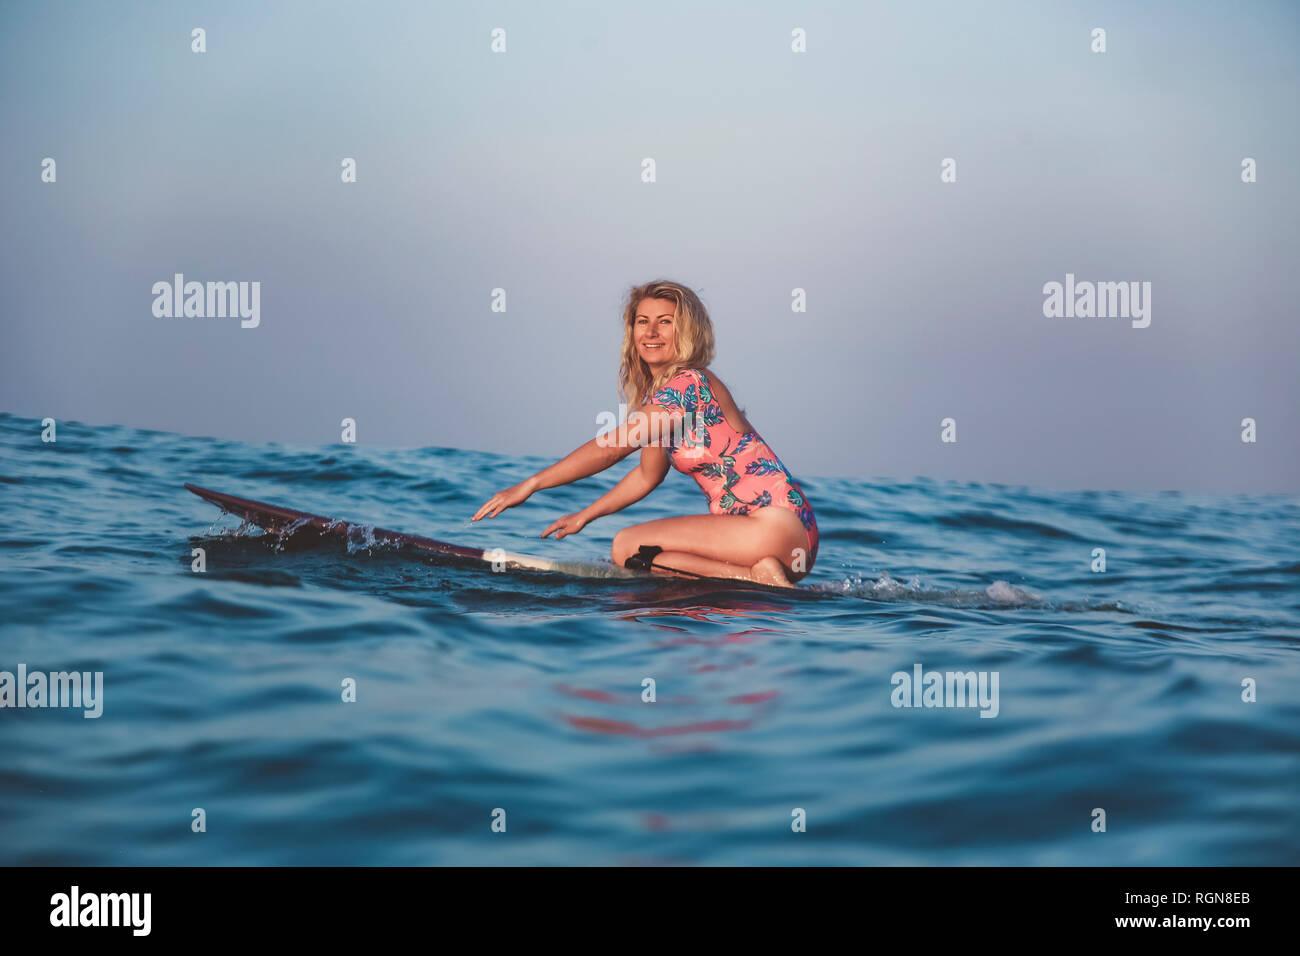 L'INDONÉSIE, Bali, pregnant woman sitting on surfboard Banque D'Images